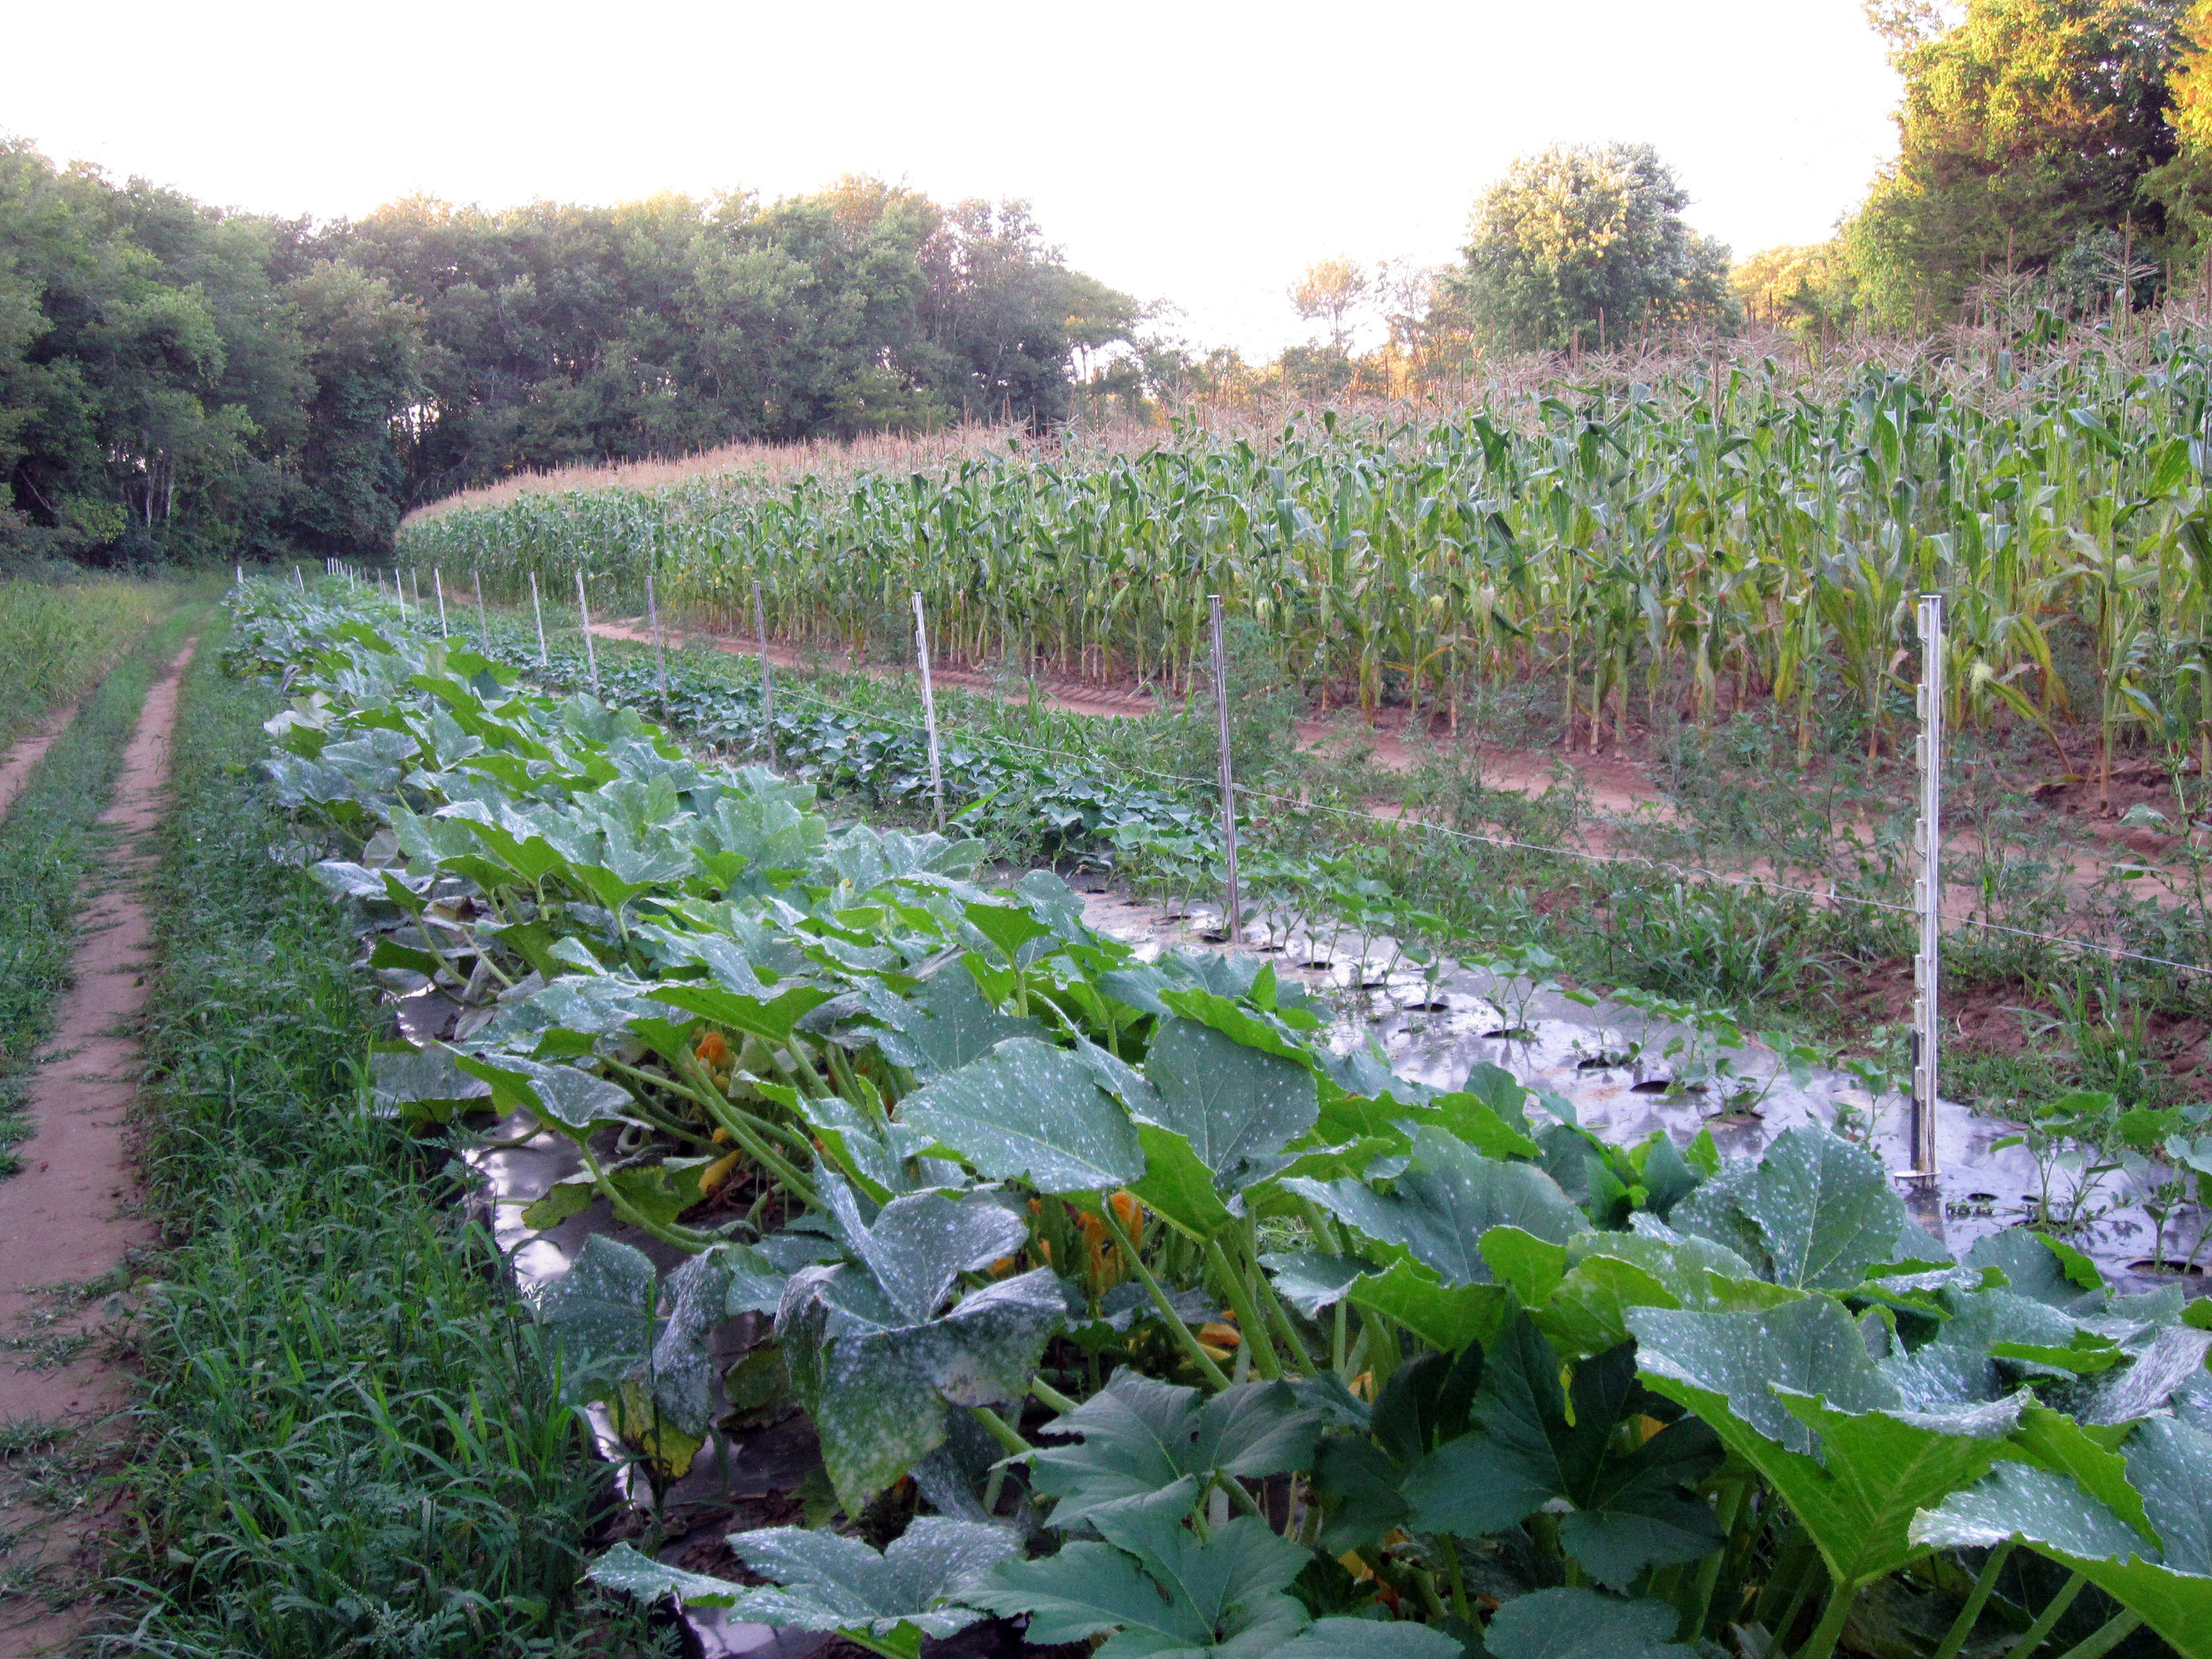 BESSETTES, FARMING on MEADOW WOODS, NEWLSETTER PHOTO 23.jpg